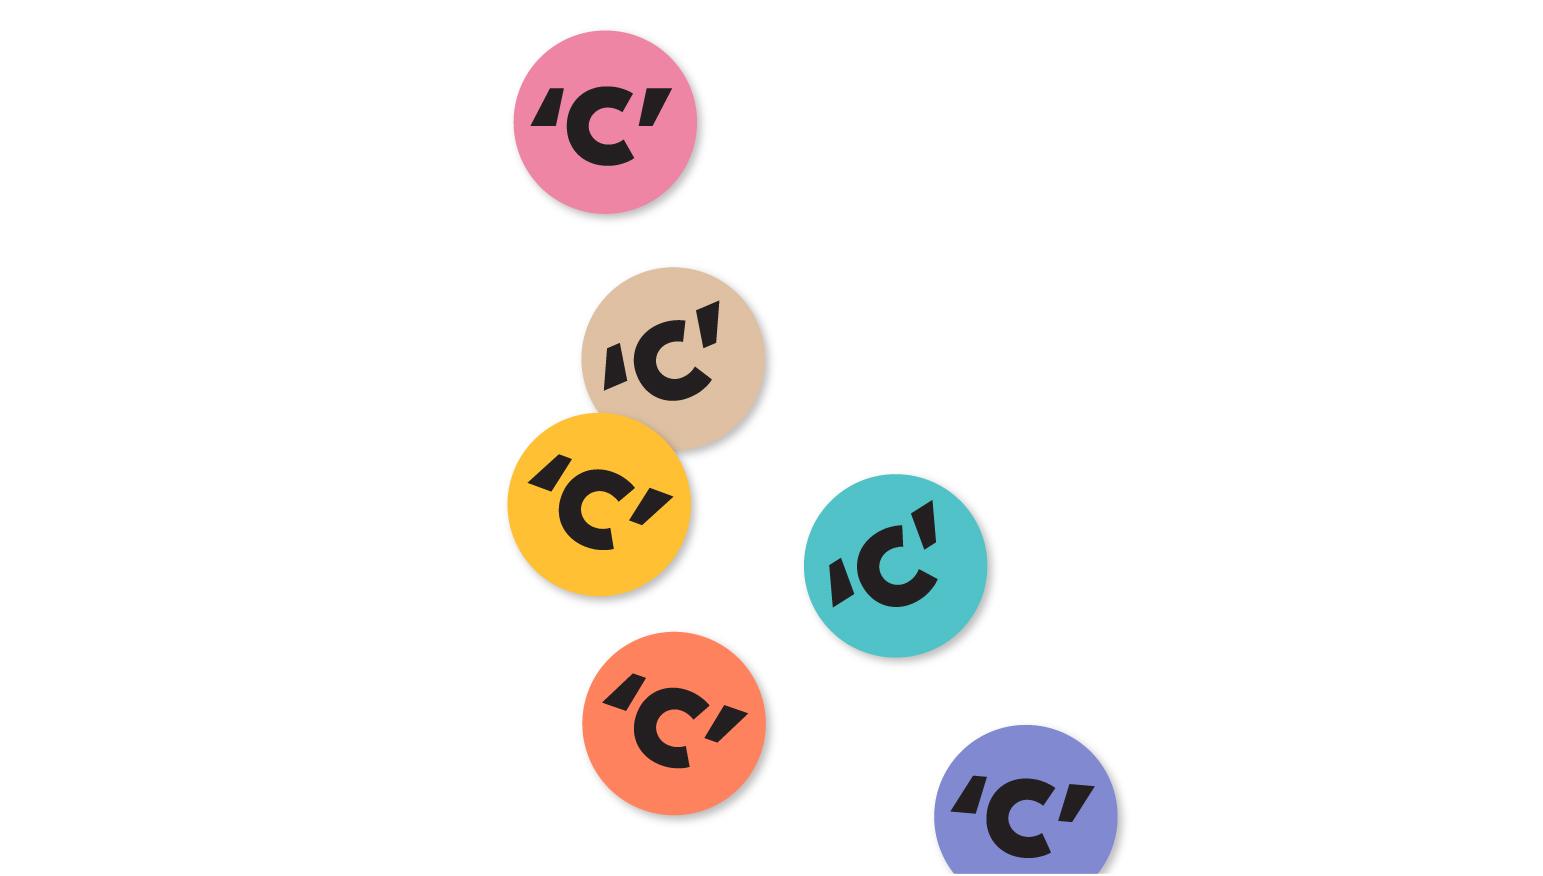 Cupla_CaseStudy_Website_Convo-04.jpg